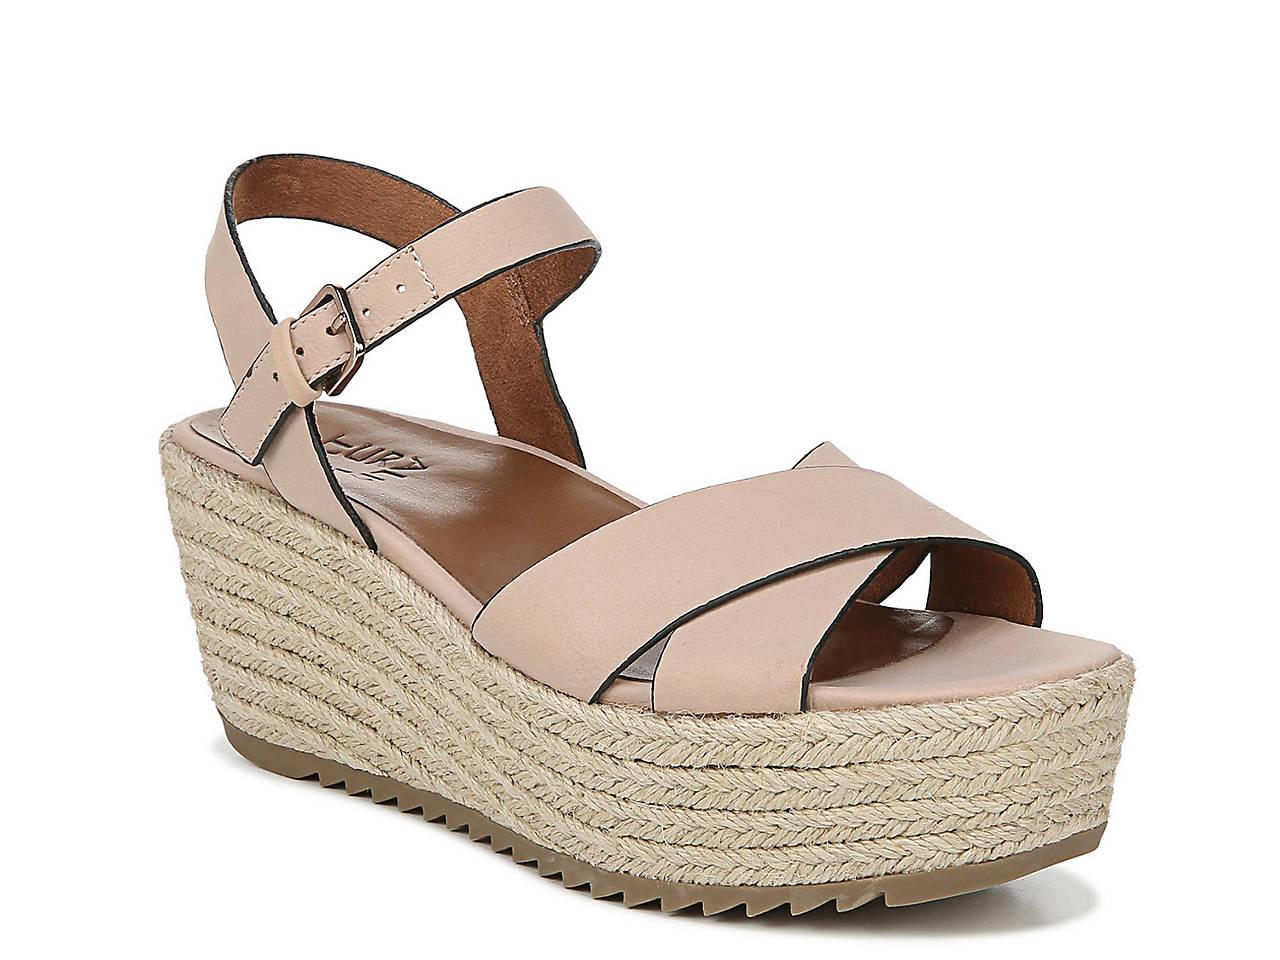 26a119f0408 Naturalizer Oceanna Espadrille Wedge Sandal Women s Shoes